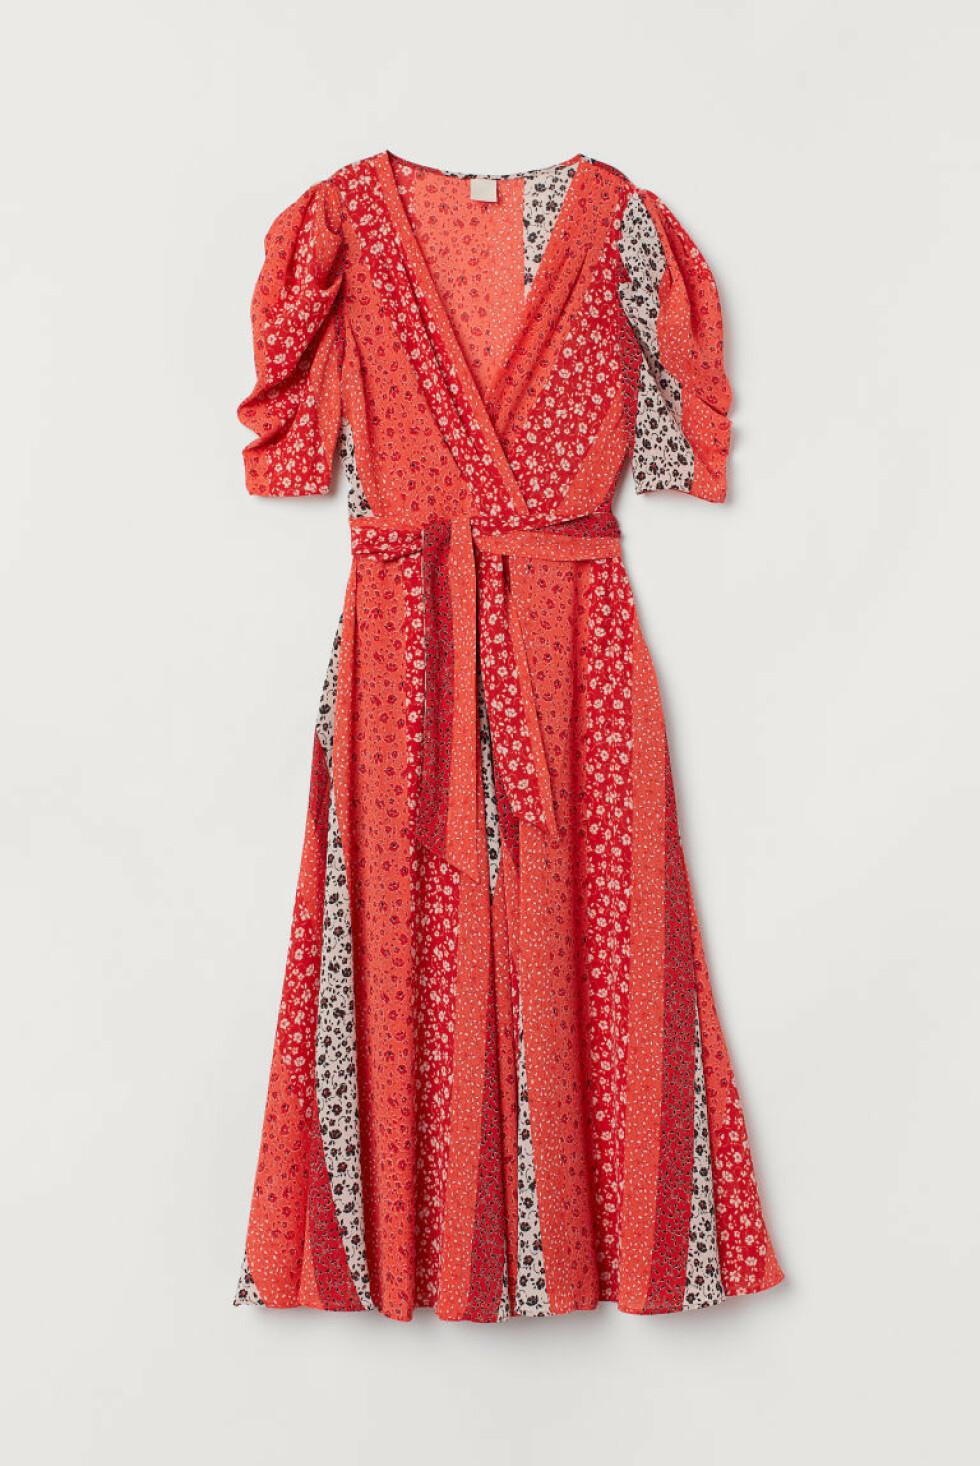 Kjole fra H&M |500,-| https://www2.hm.com/no_no/productpage.0741150008.html